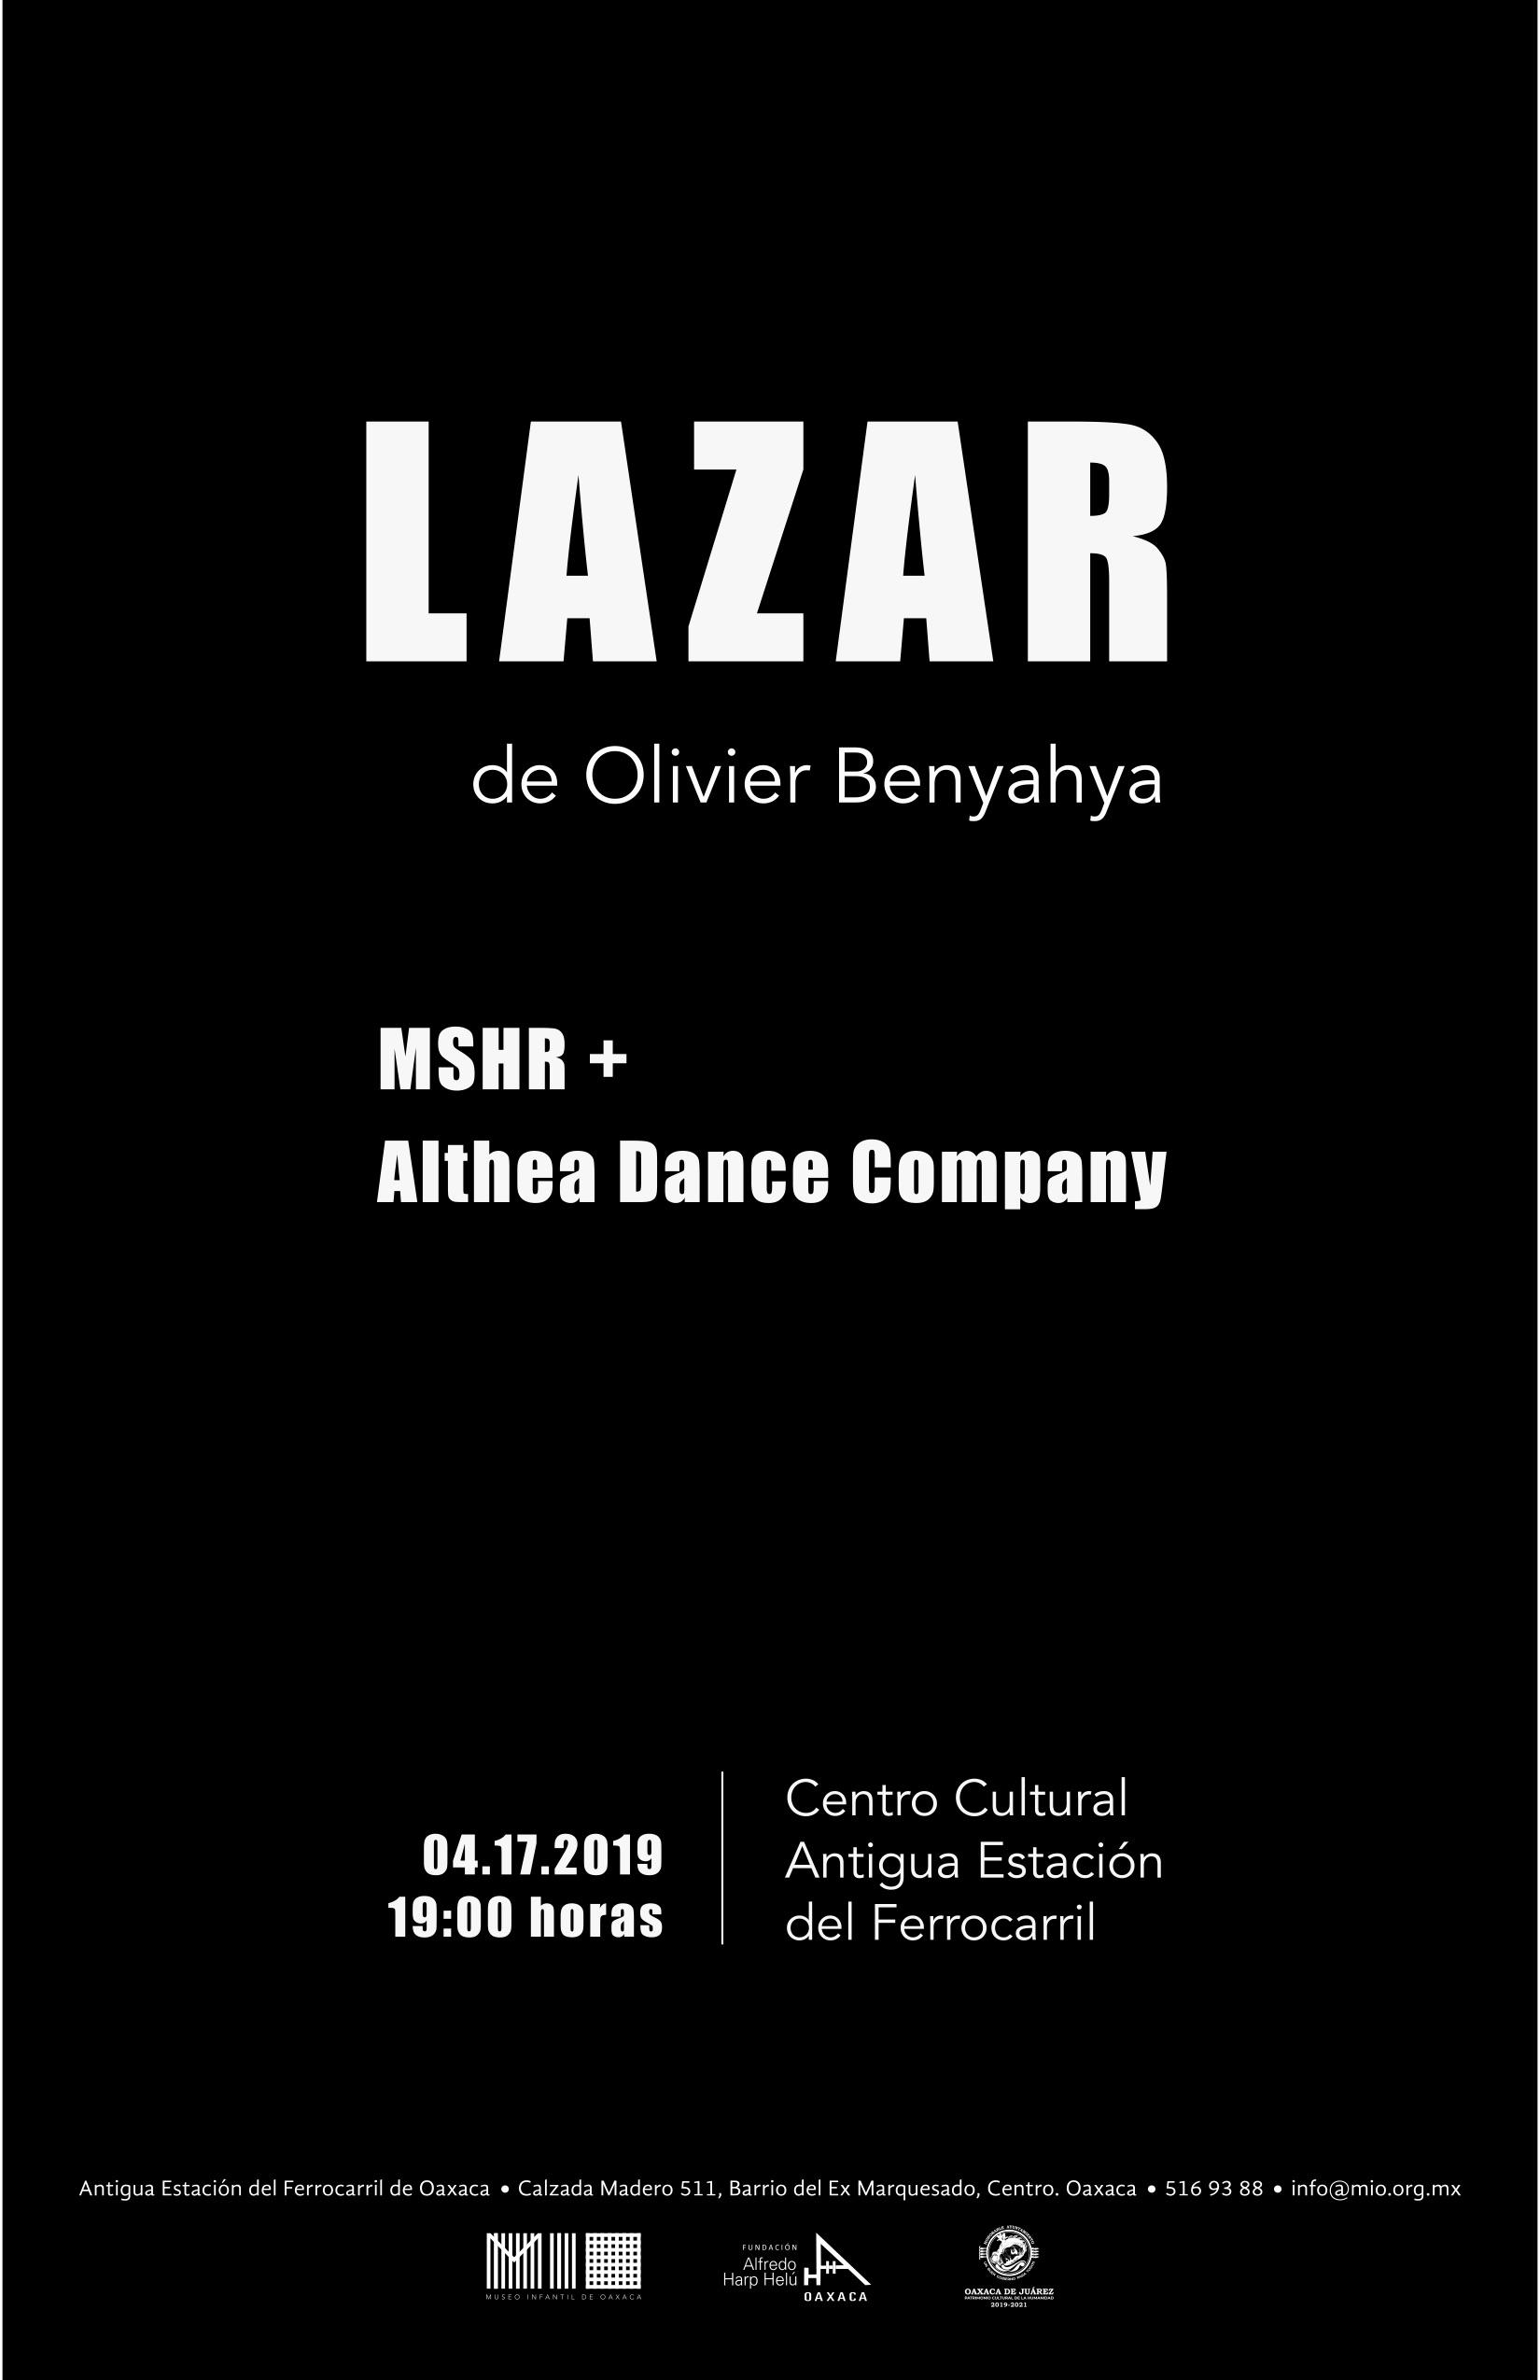 LAZAR - Dancers: Geovanni Ortega, Thea BautistaChoreographer: Thea BautistaText and Voice: Olivier BenyahyaMusic: MSHR Art Collective2019